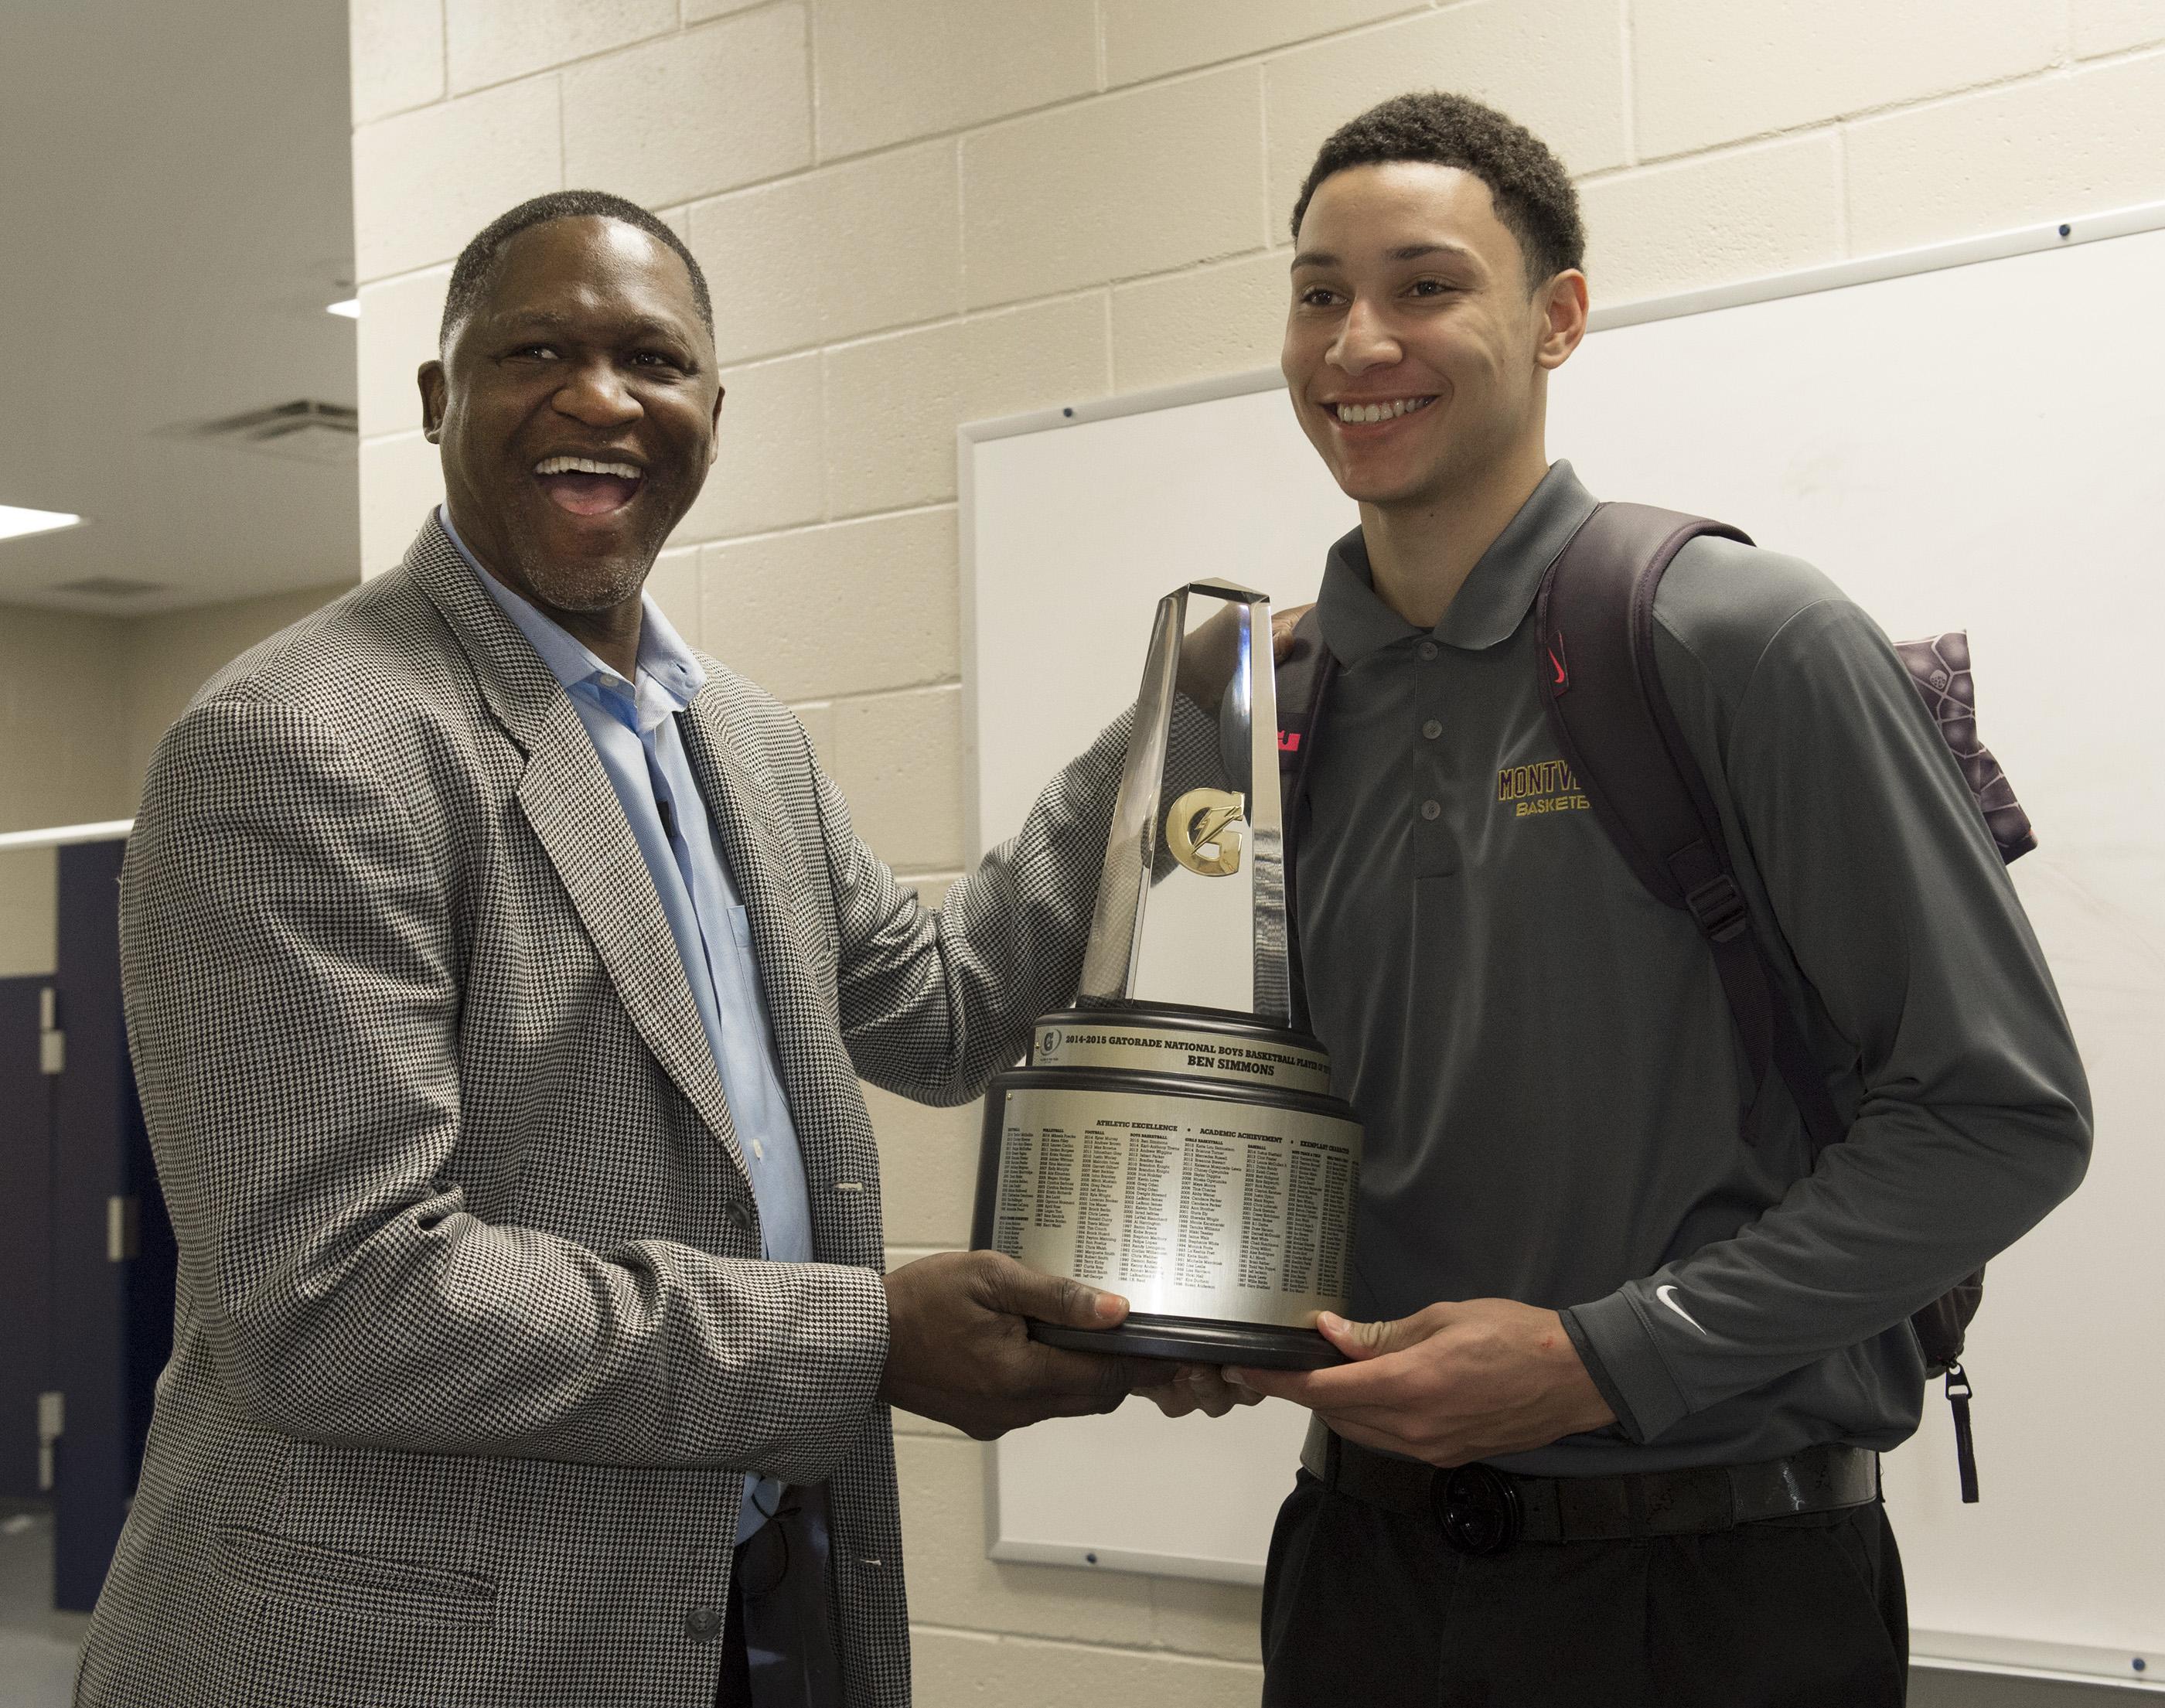 Future LSU big man Ben Simmons wins Gatorade Basketball Player of the Year. (Photo: Susan Goldman / Gatorade)